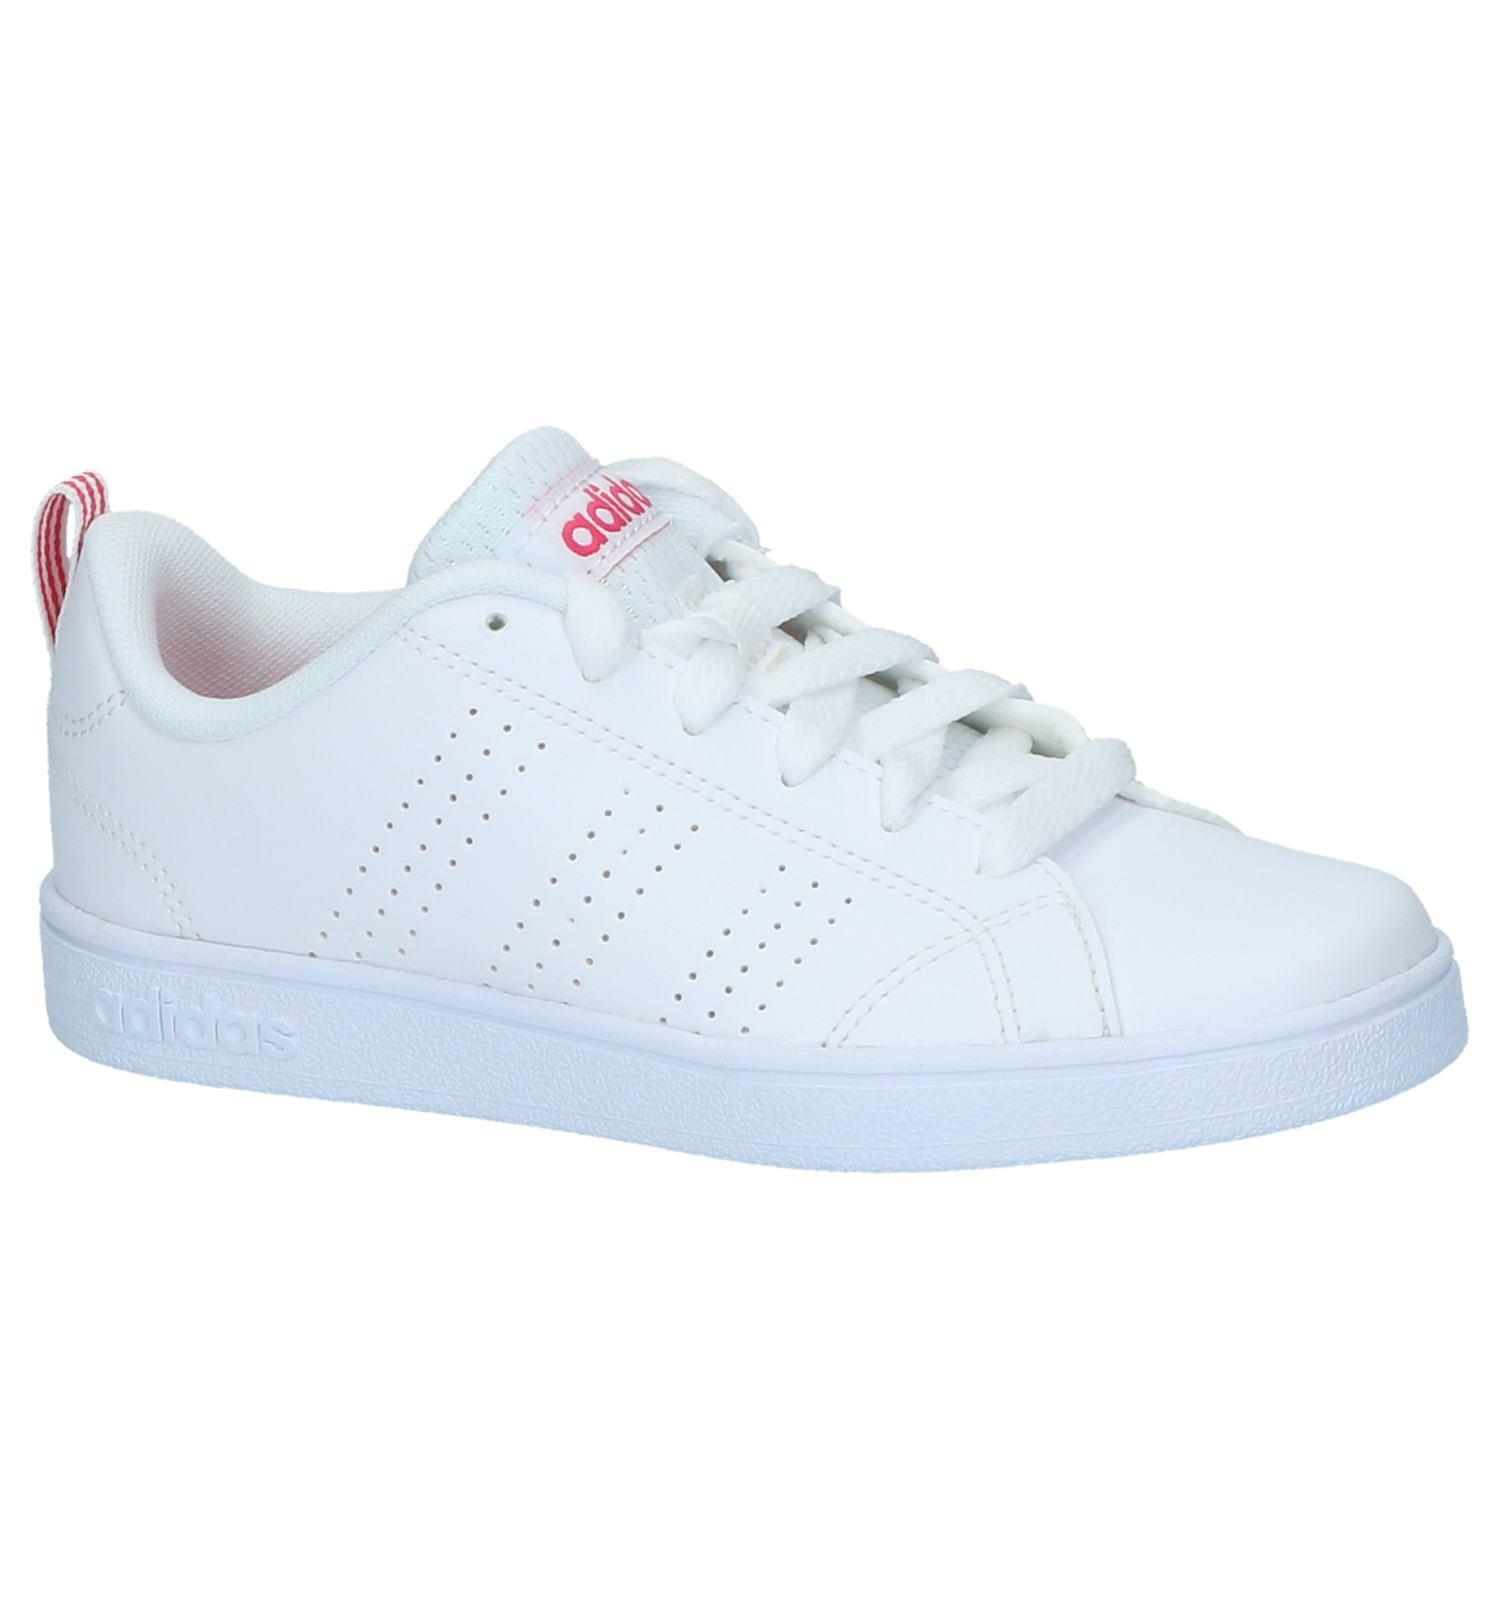 WitRoze Sneakers adidas VS Advantage Clean | SCHOENENTORFS.NL | Gratis verzend en retour